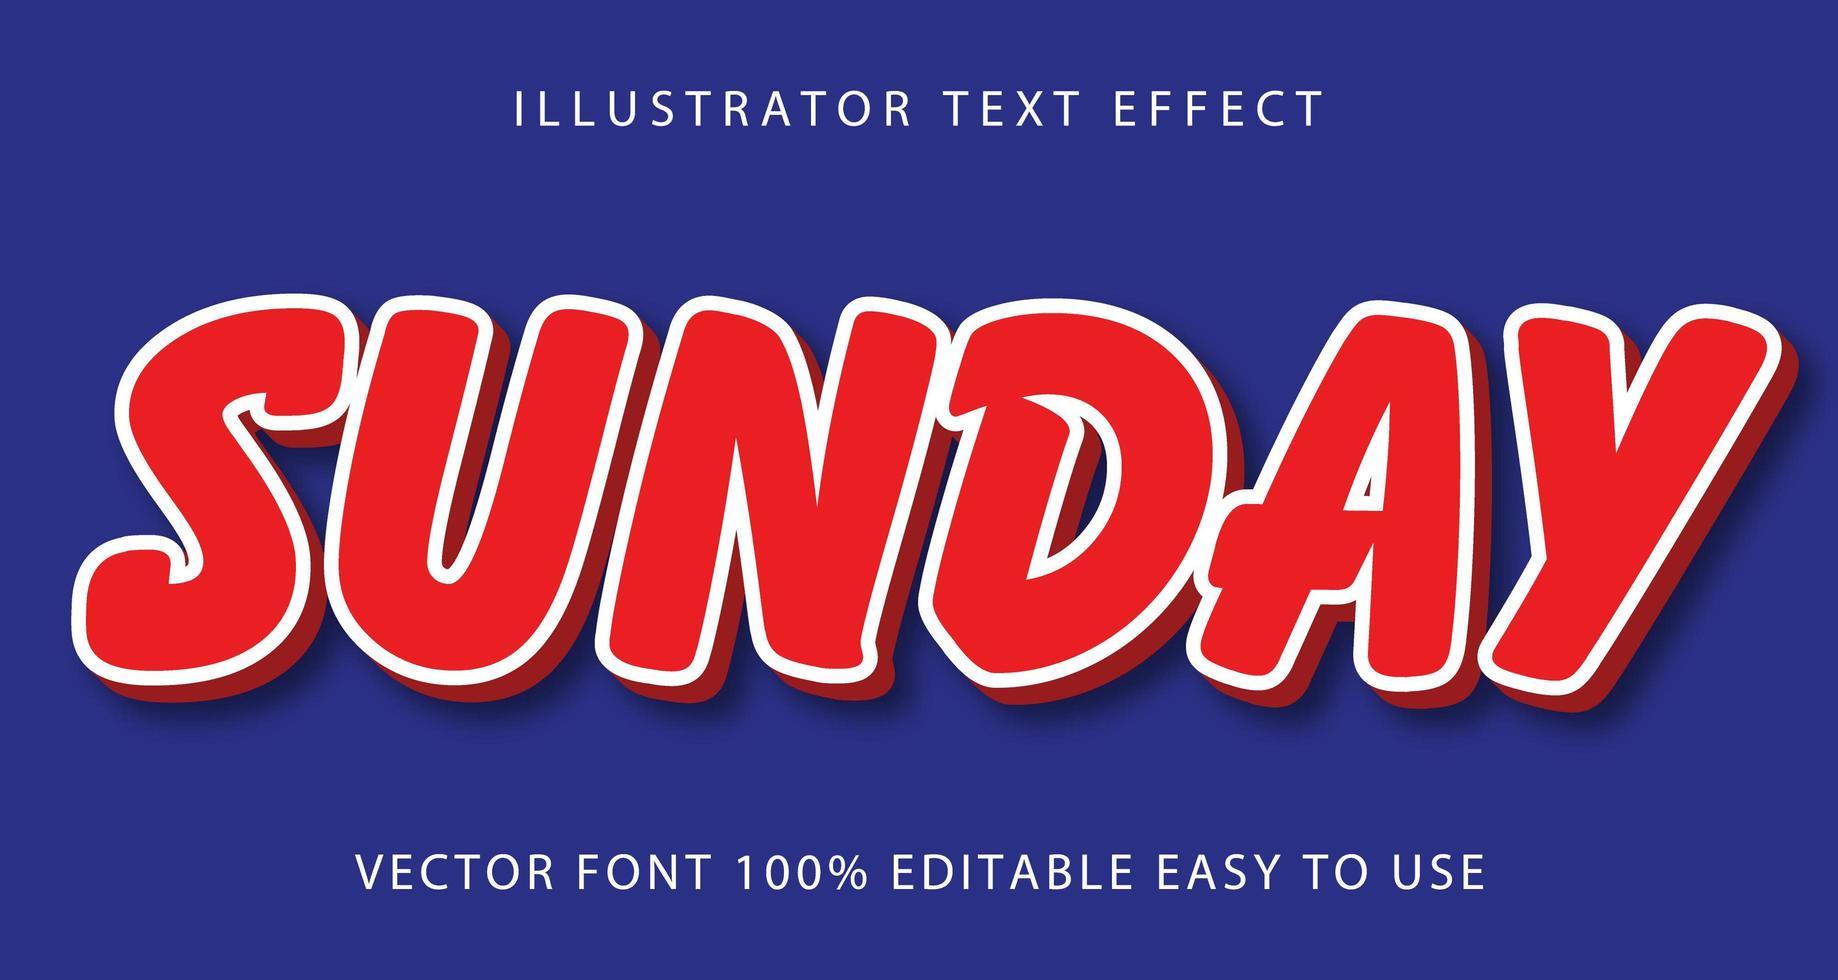 röd, vit linje söndag texteffekt vektor